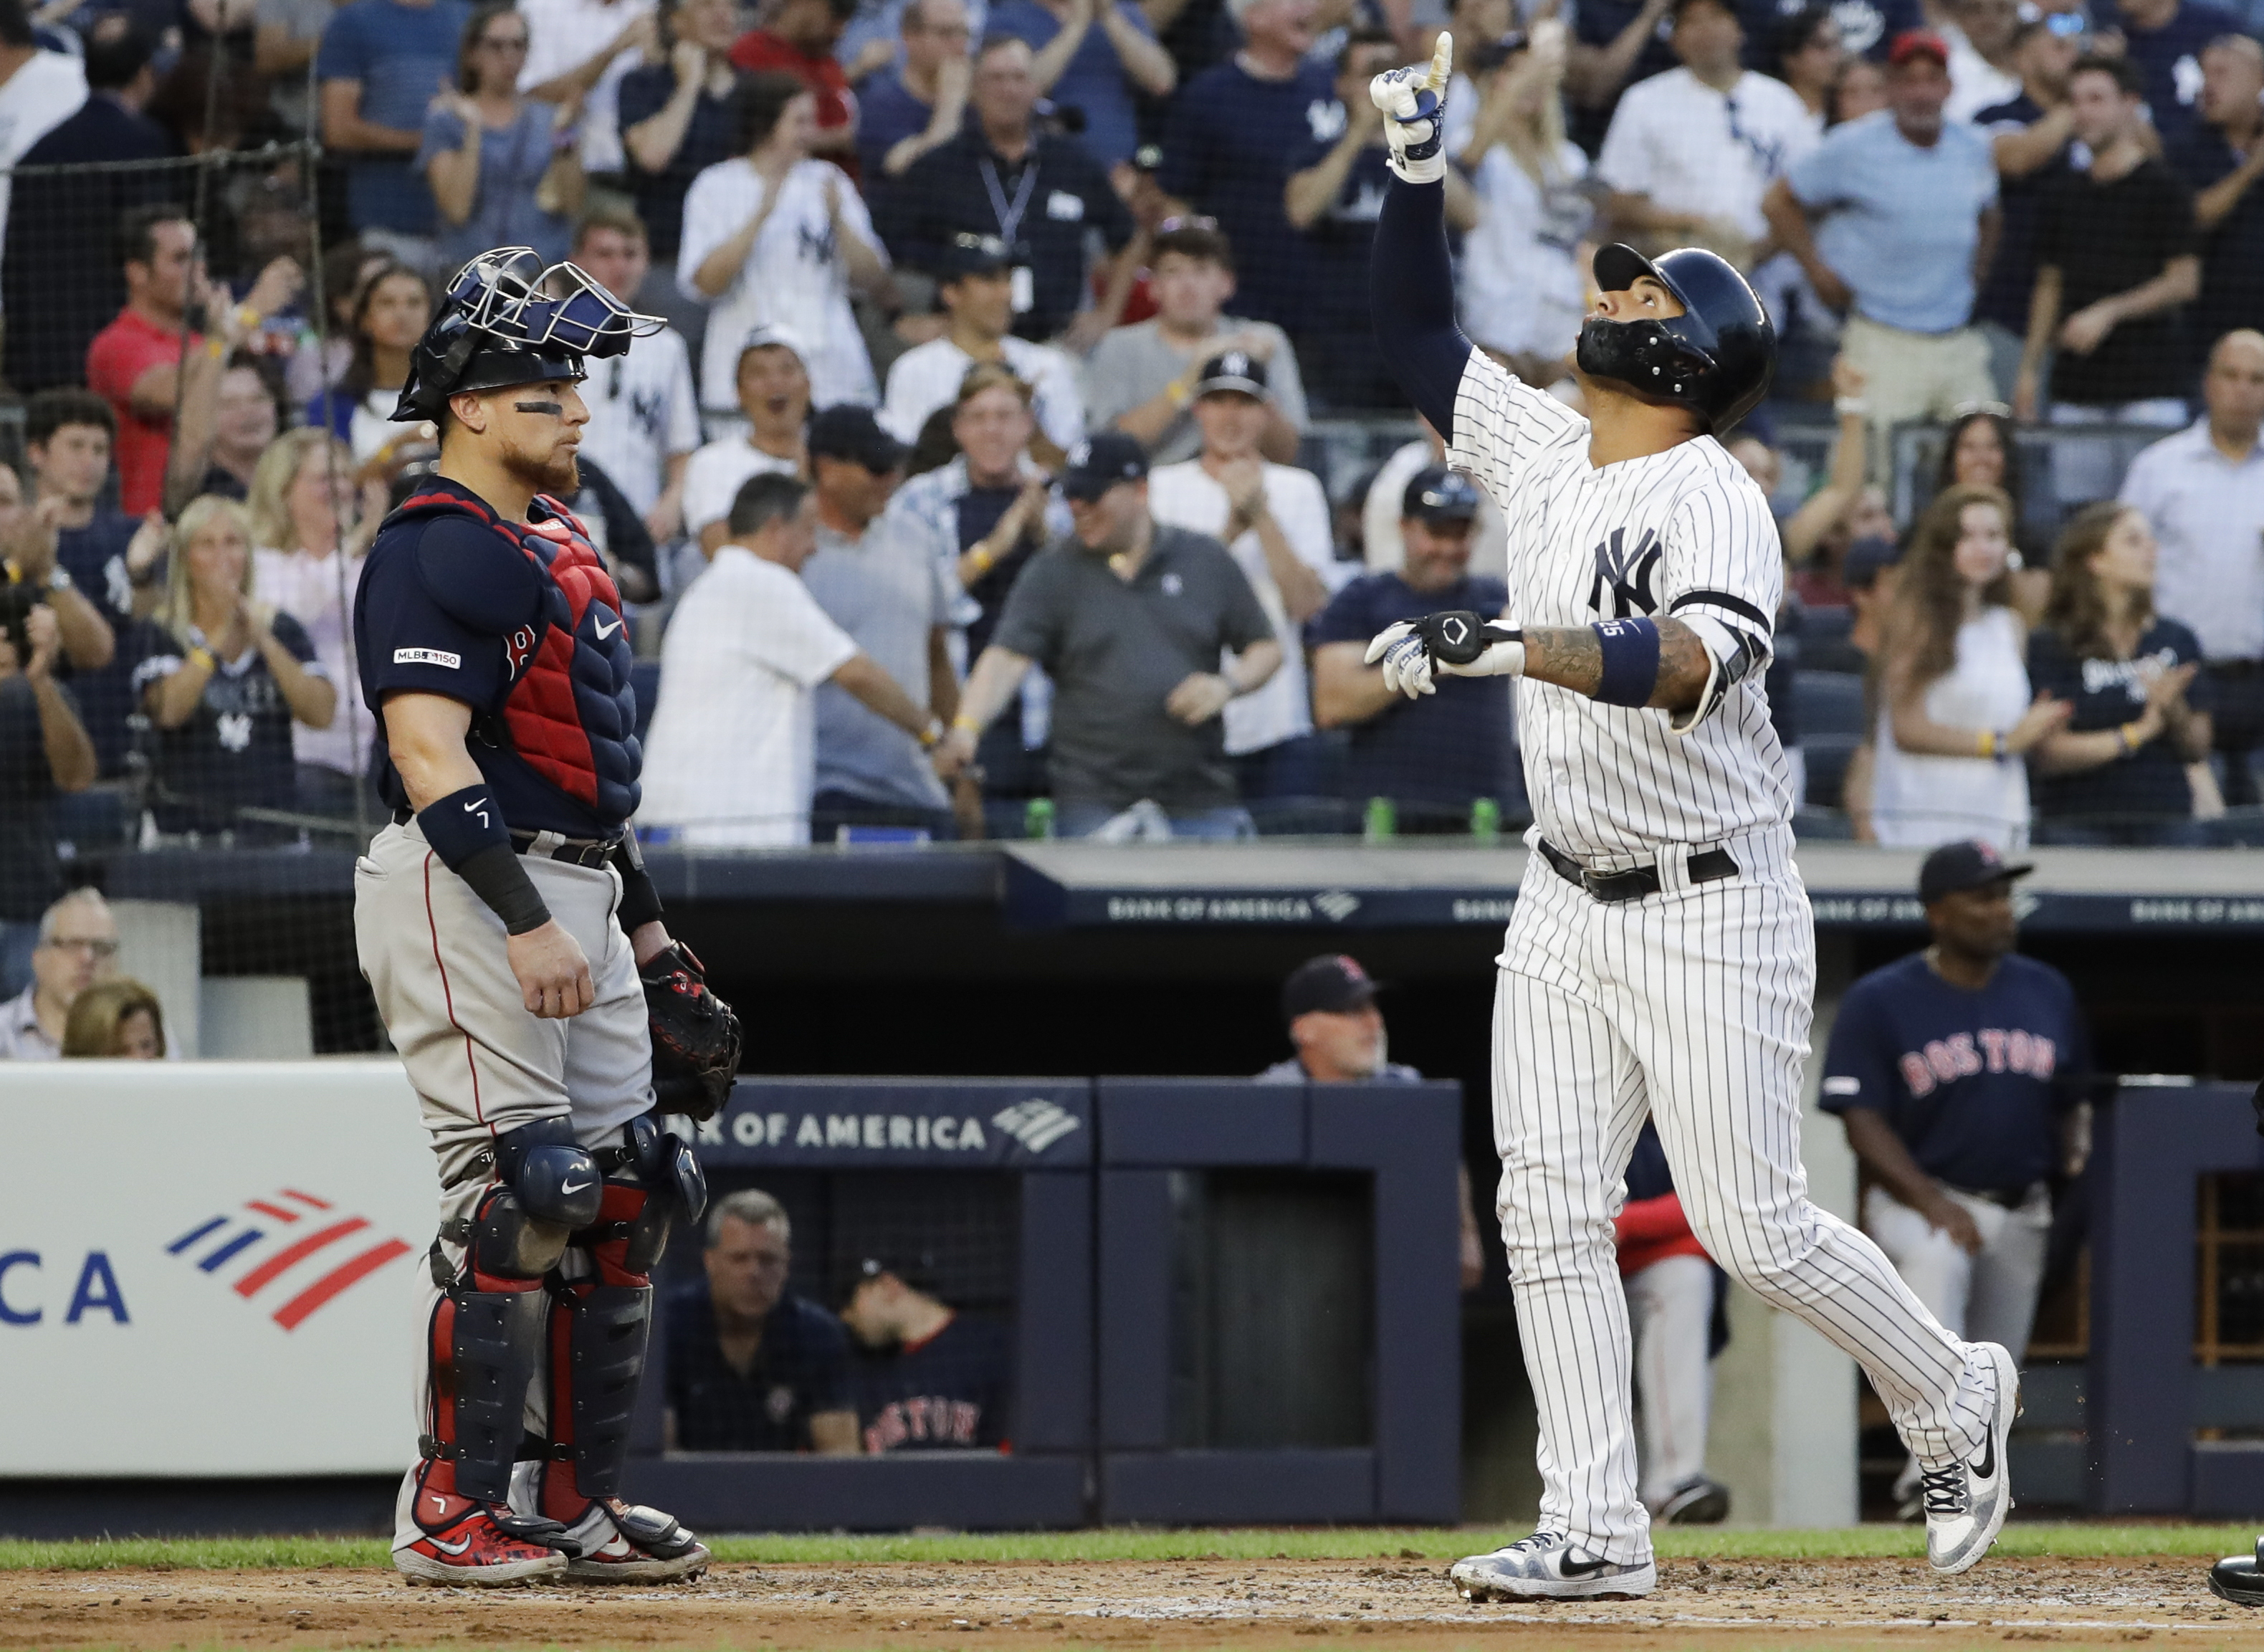 Torres hits slam, Yankees 3-hit skidding Red Sox 4-2